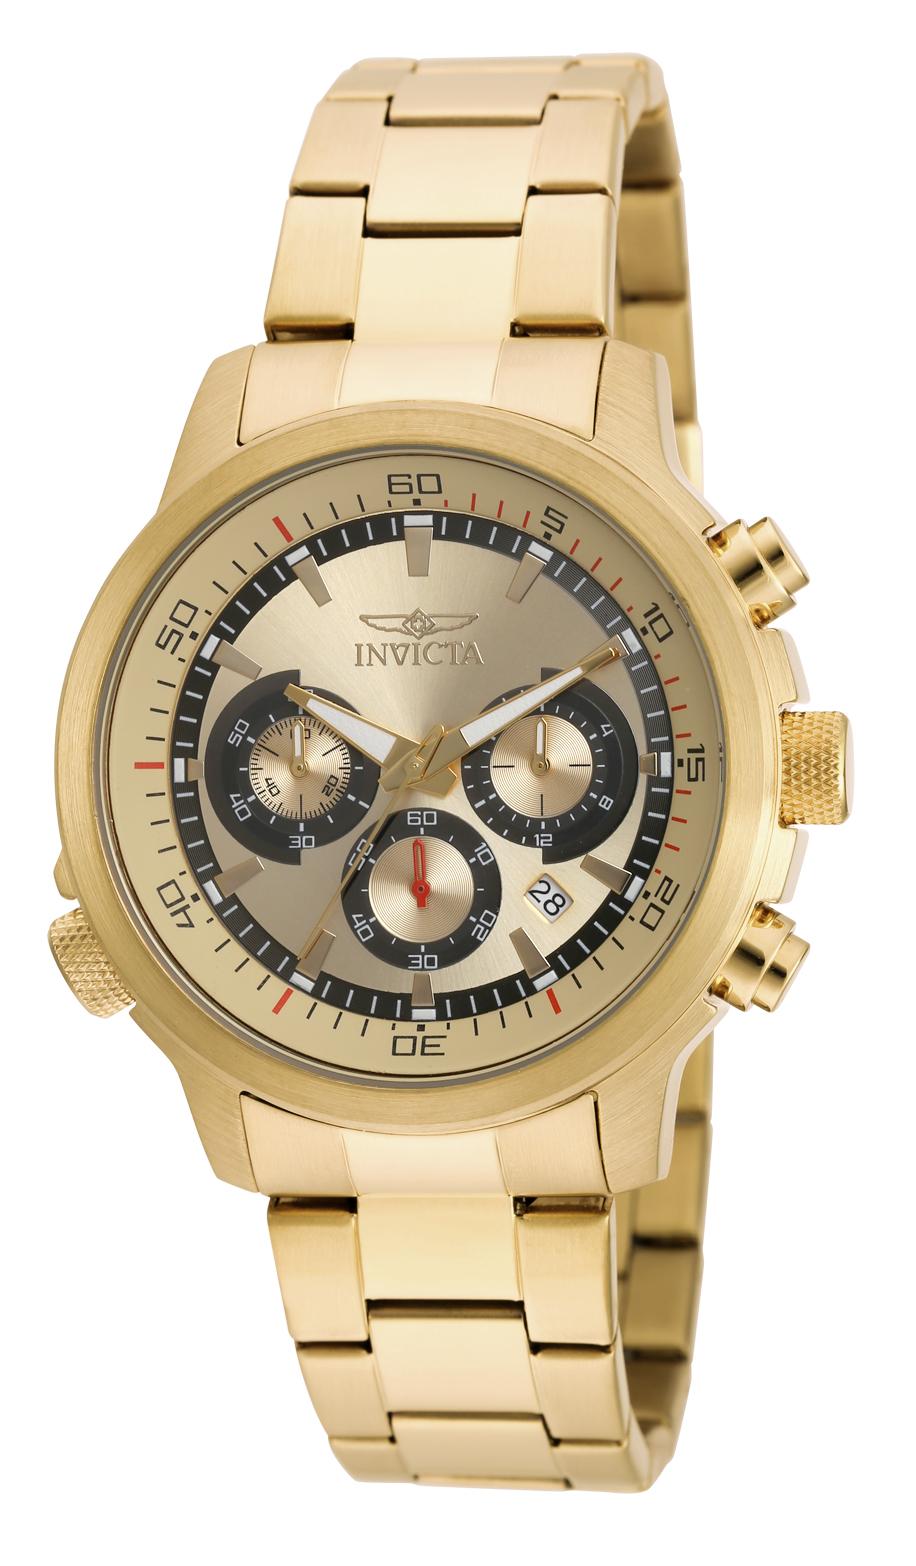 Invicta Men's 19240 Specialty Quartz Chronograph Gold Dial Watch